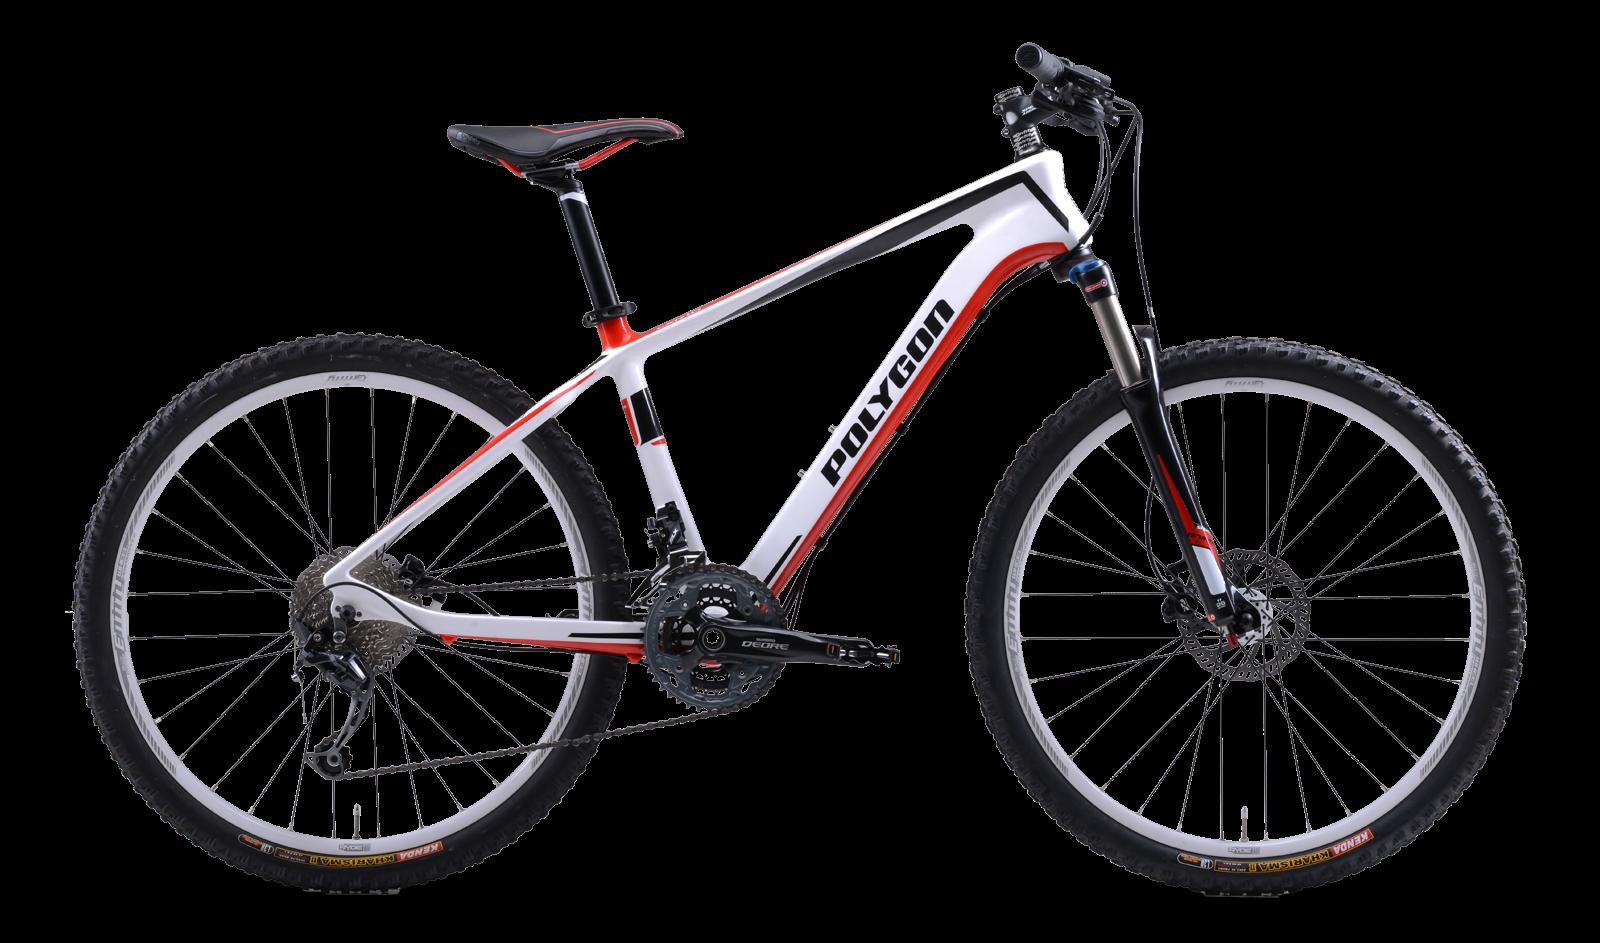 Fia Bike Sepeda Gunung Polygon Cozmic Cxr10 Series 2013 Balap Helios A60 700c